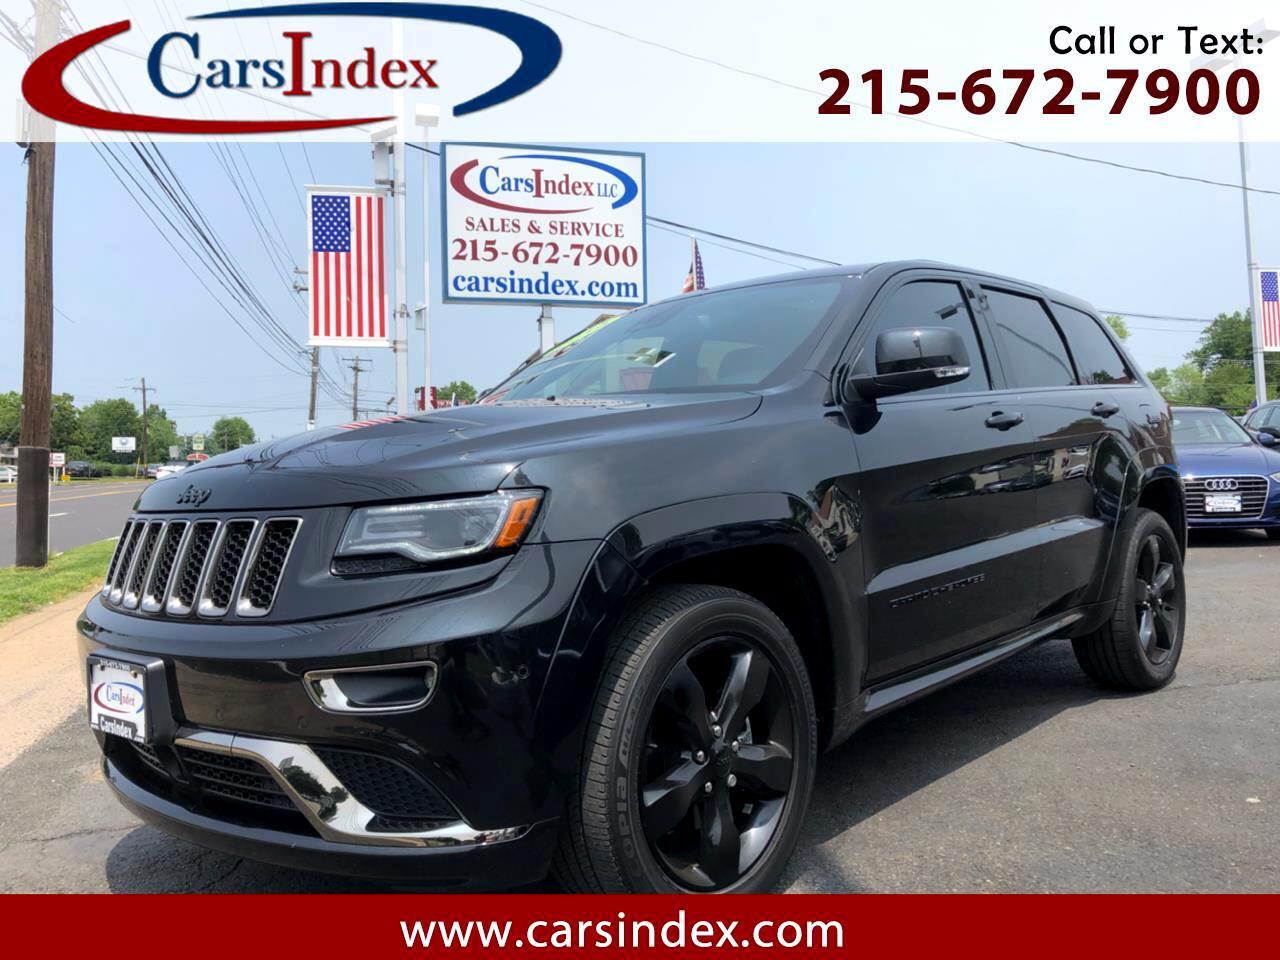 2016 Jeep Grand Cherokee Overland 4x4